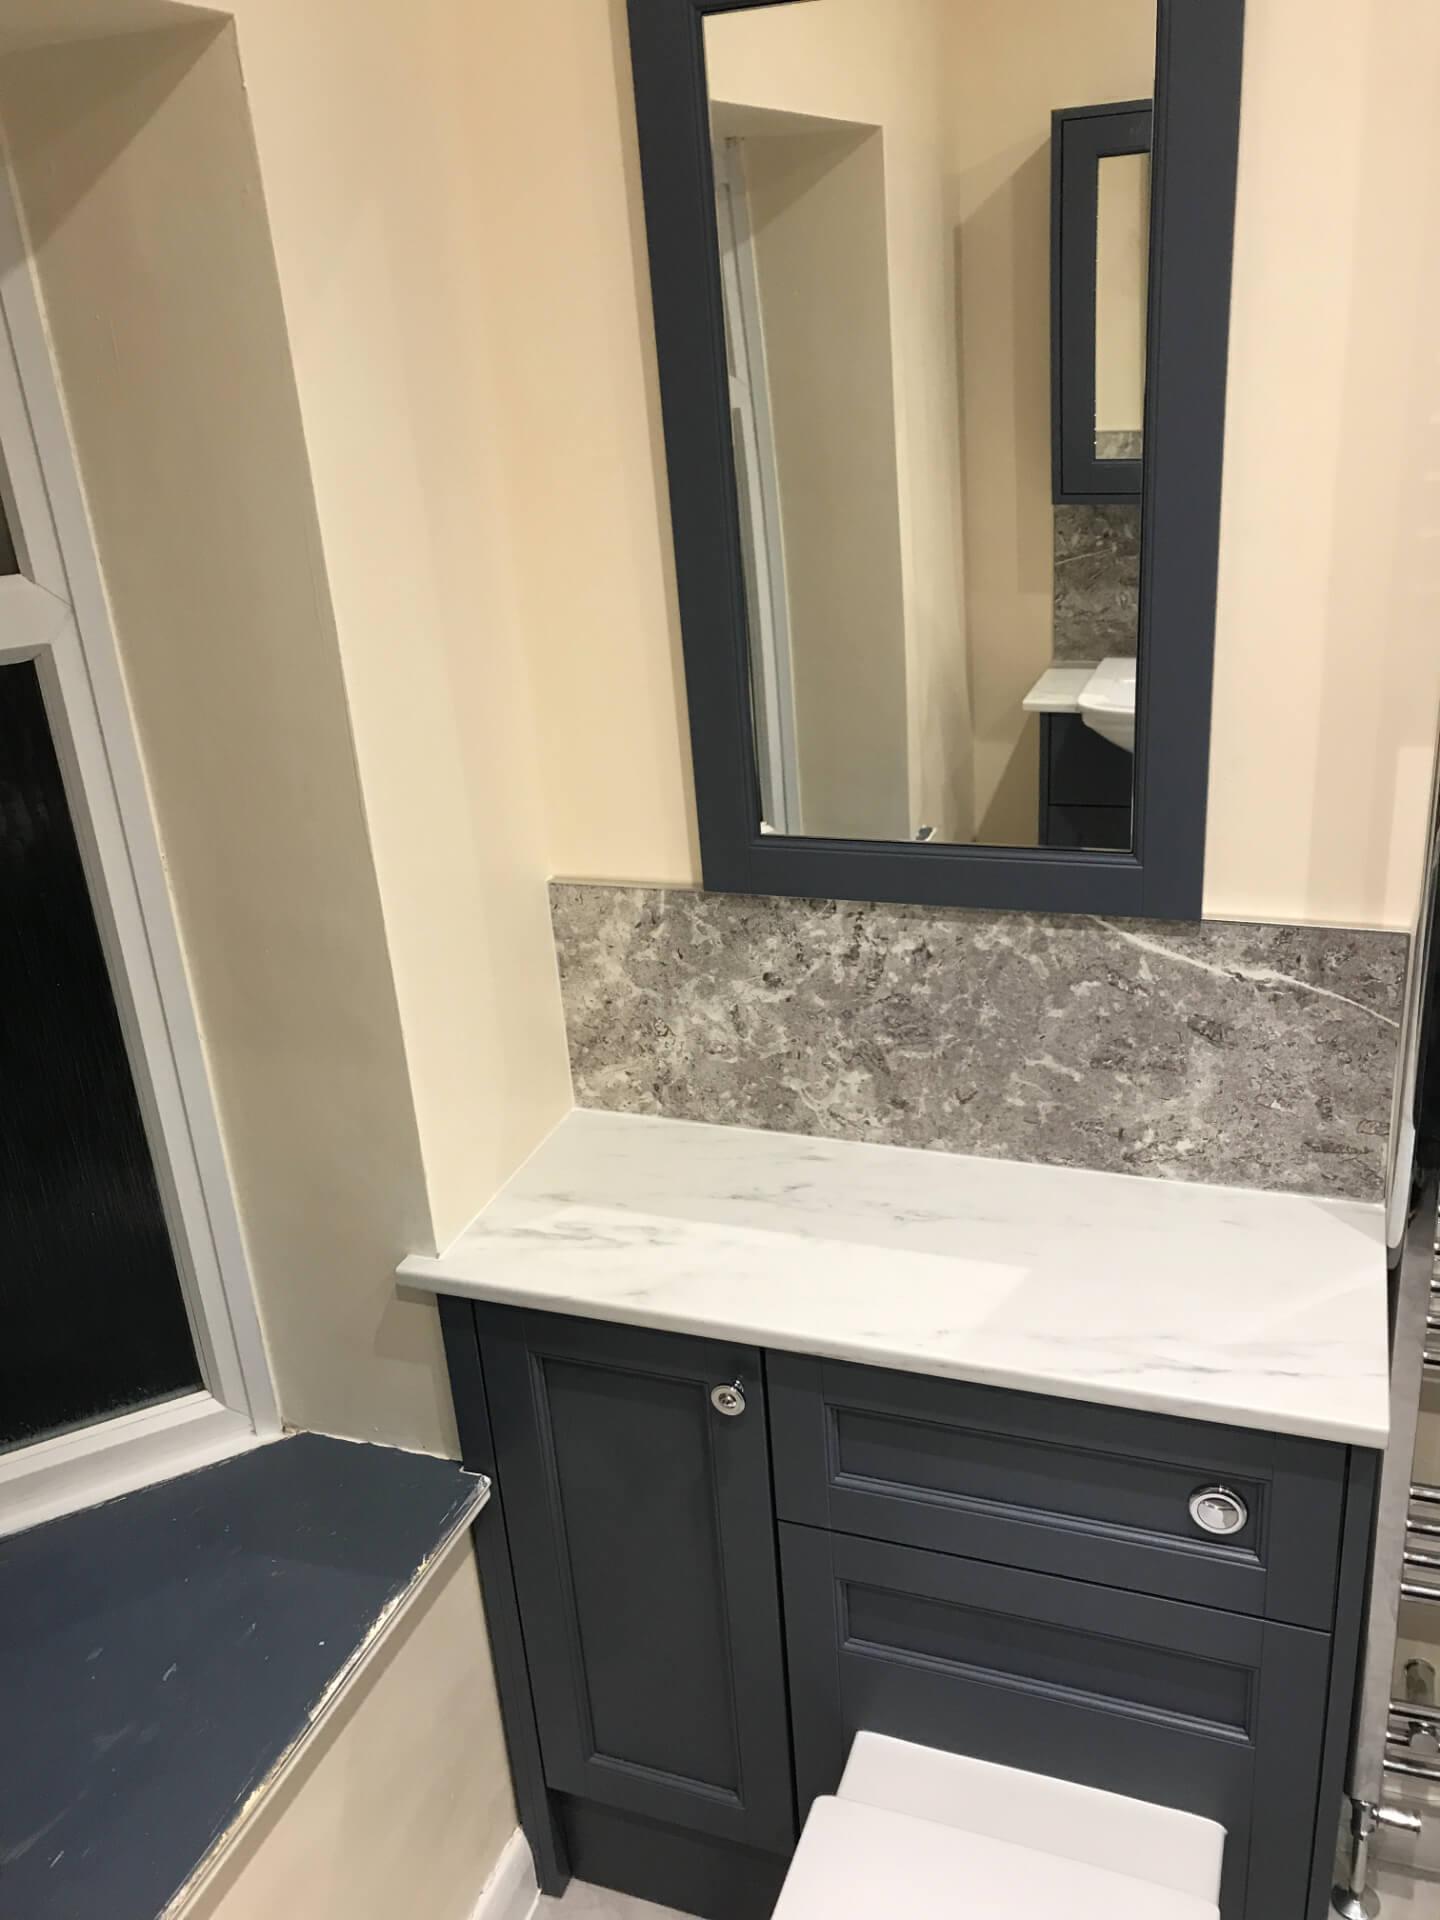 New Sink Unit